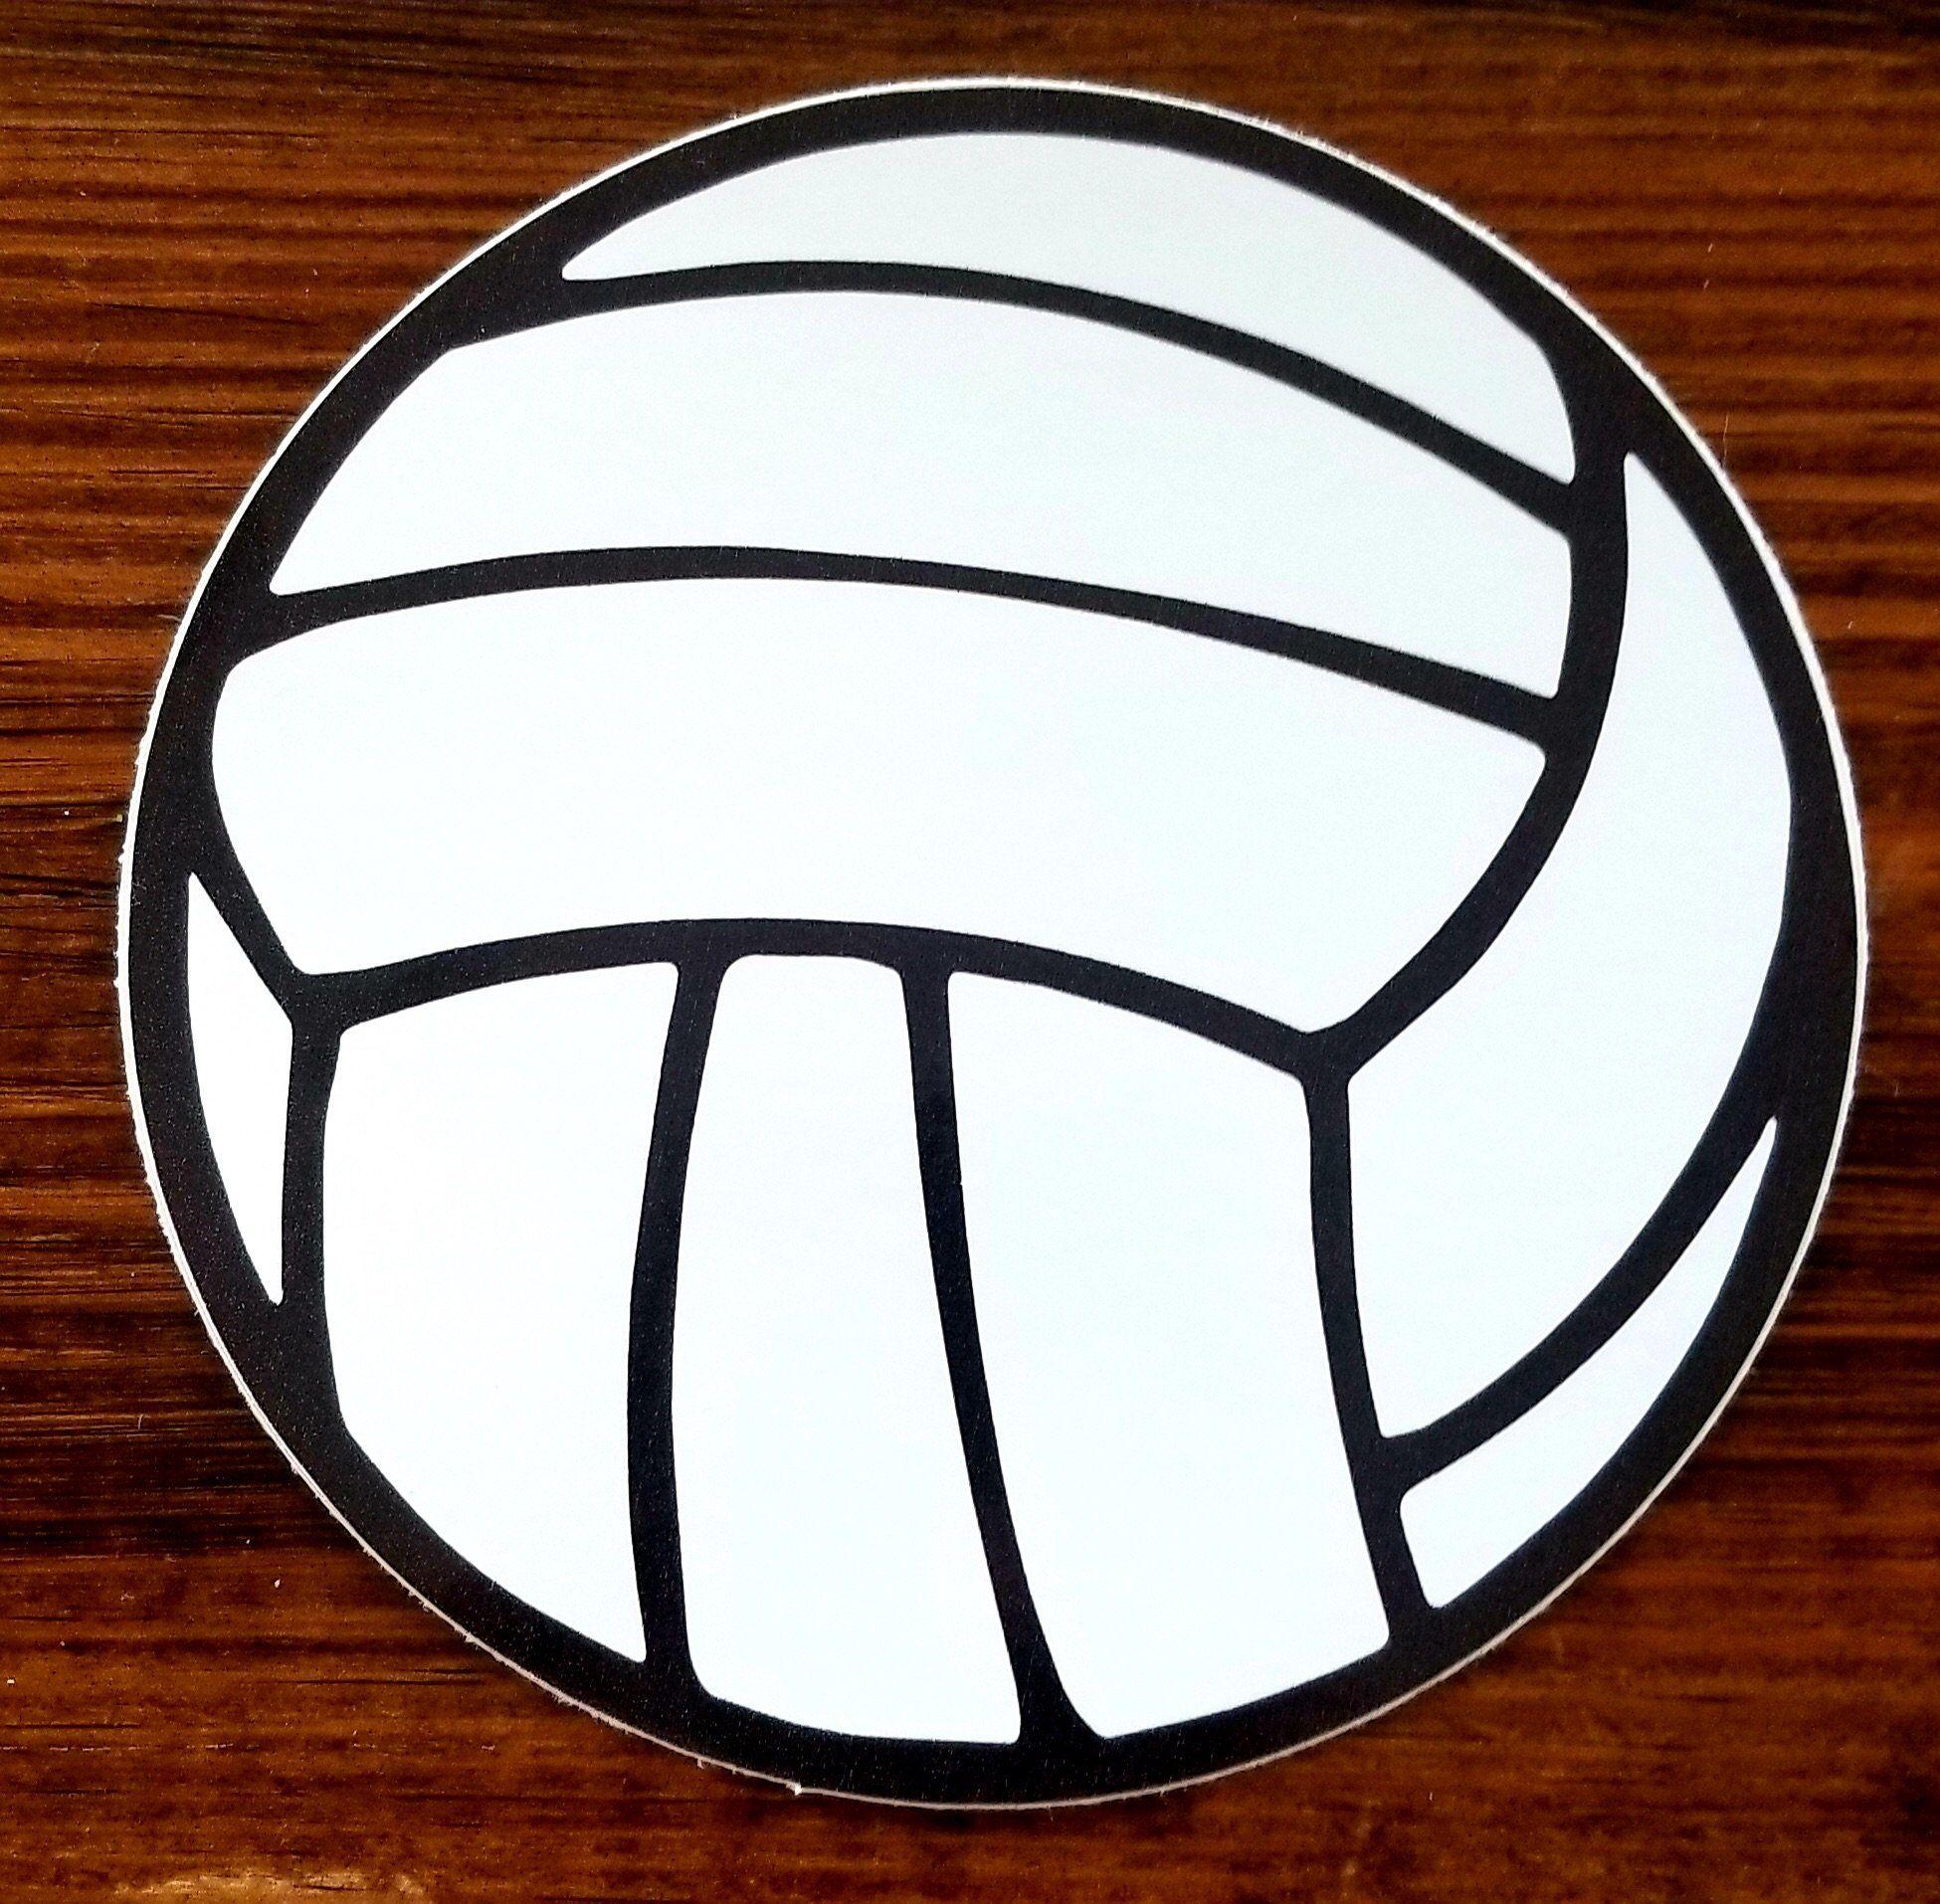 Volleyball Sticker In 2021 Volleyball Stickers Preppy Stickers [ 1914 x 1950 Pixel ]